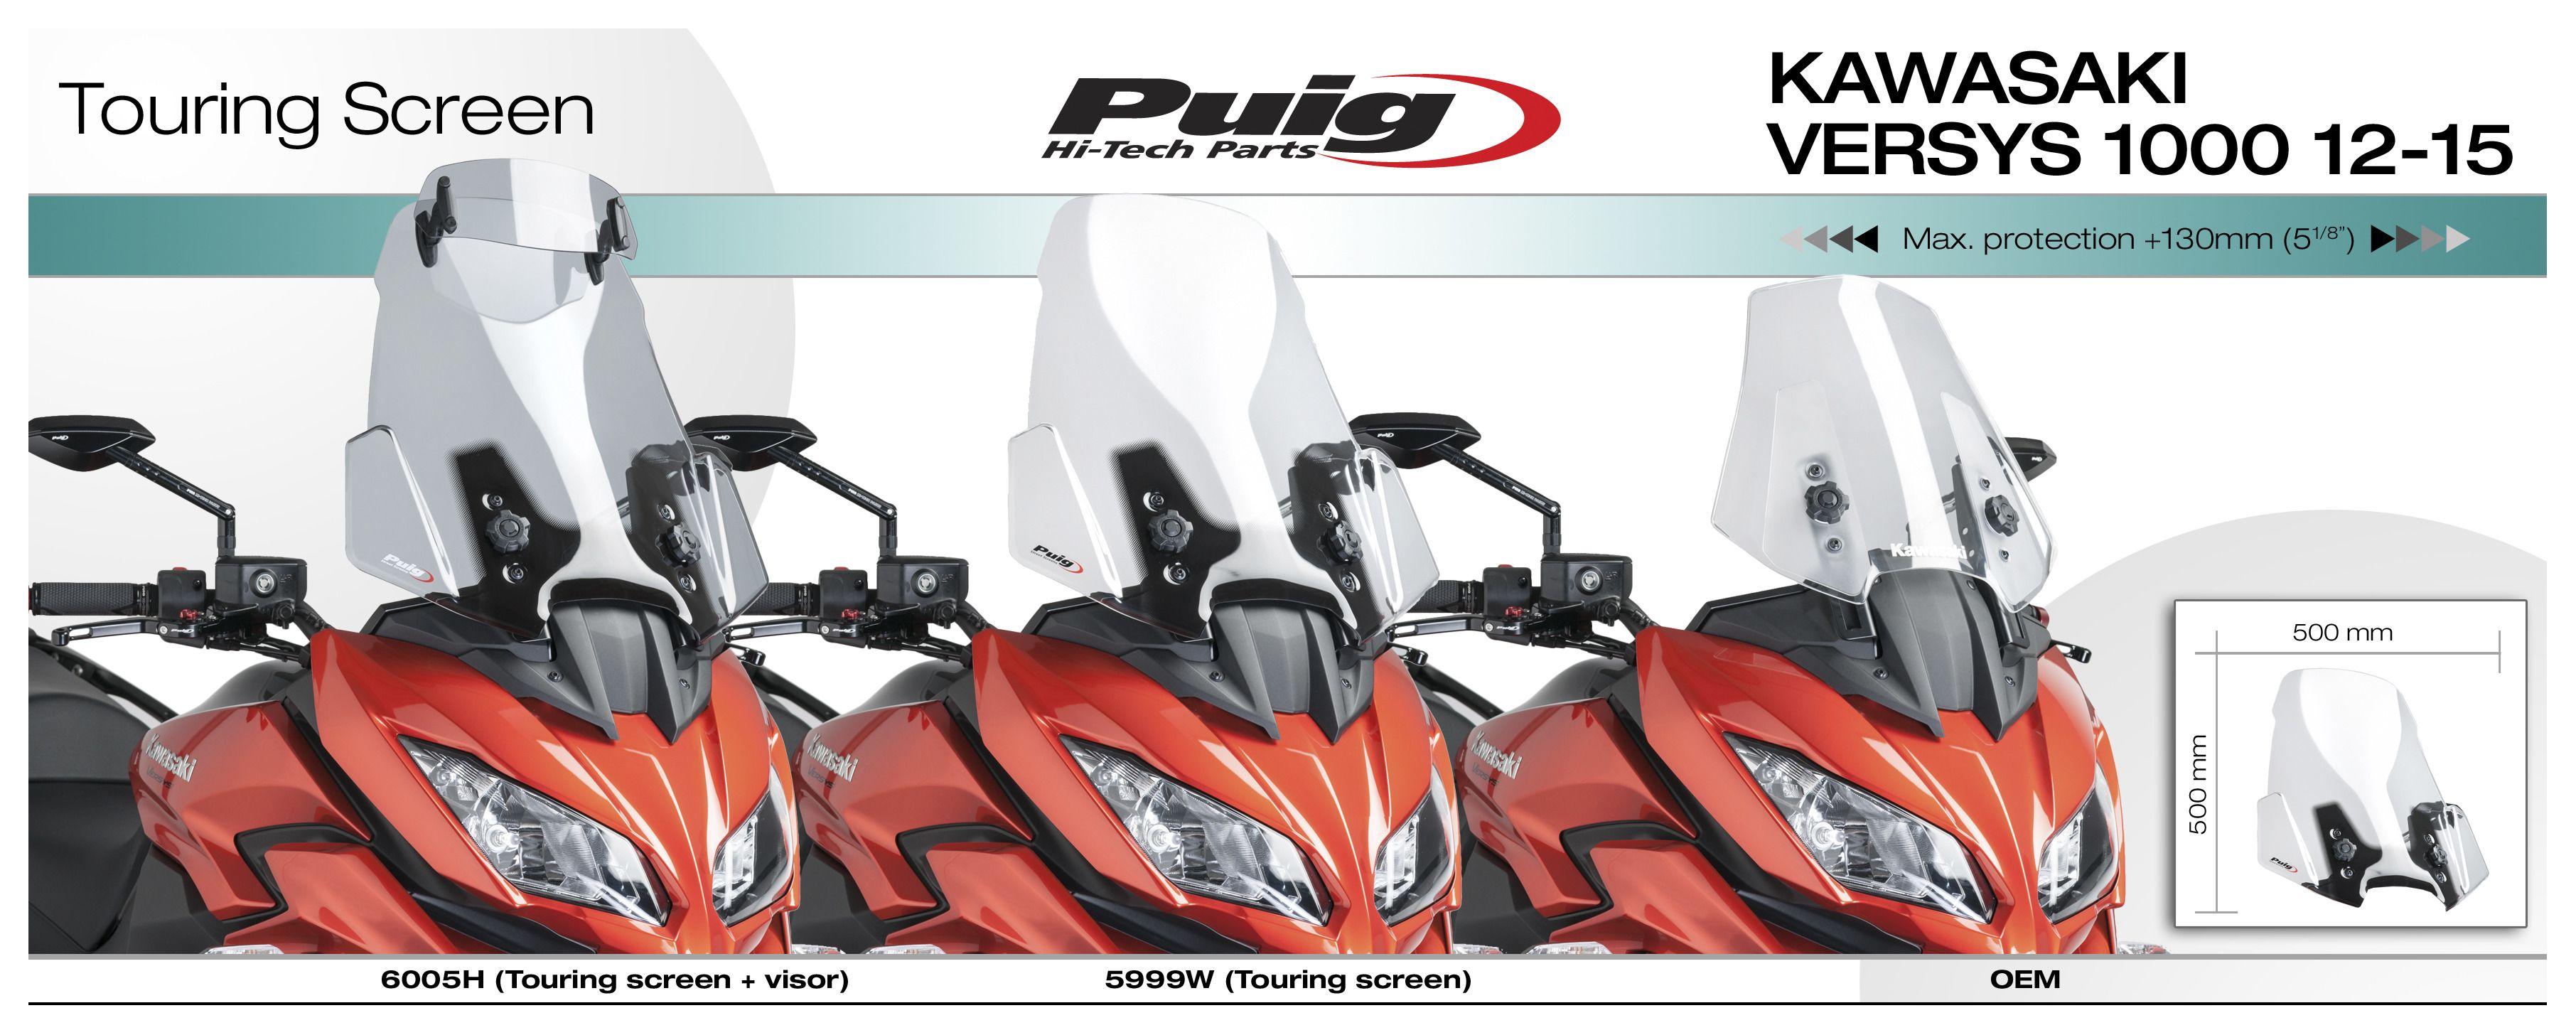 puig_touring_windscreen_kawasaki_versys100020122013 puig touring windscreen kawasaki versys 650 1000 revzilla  at mifinder.co